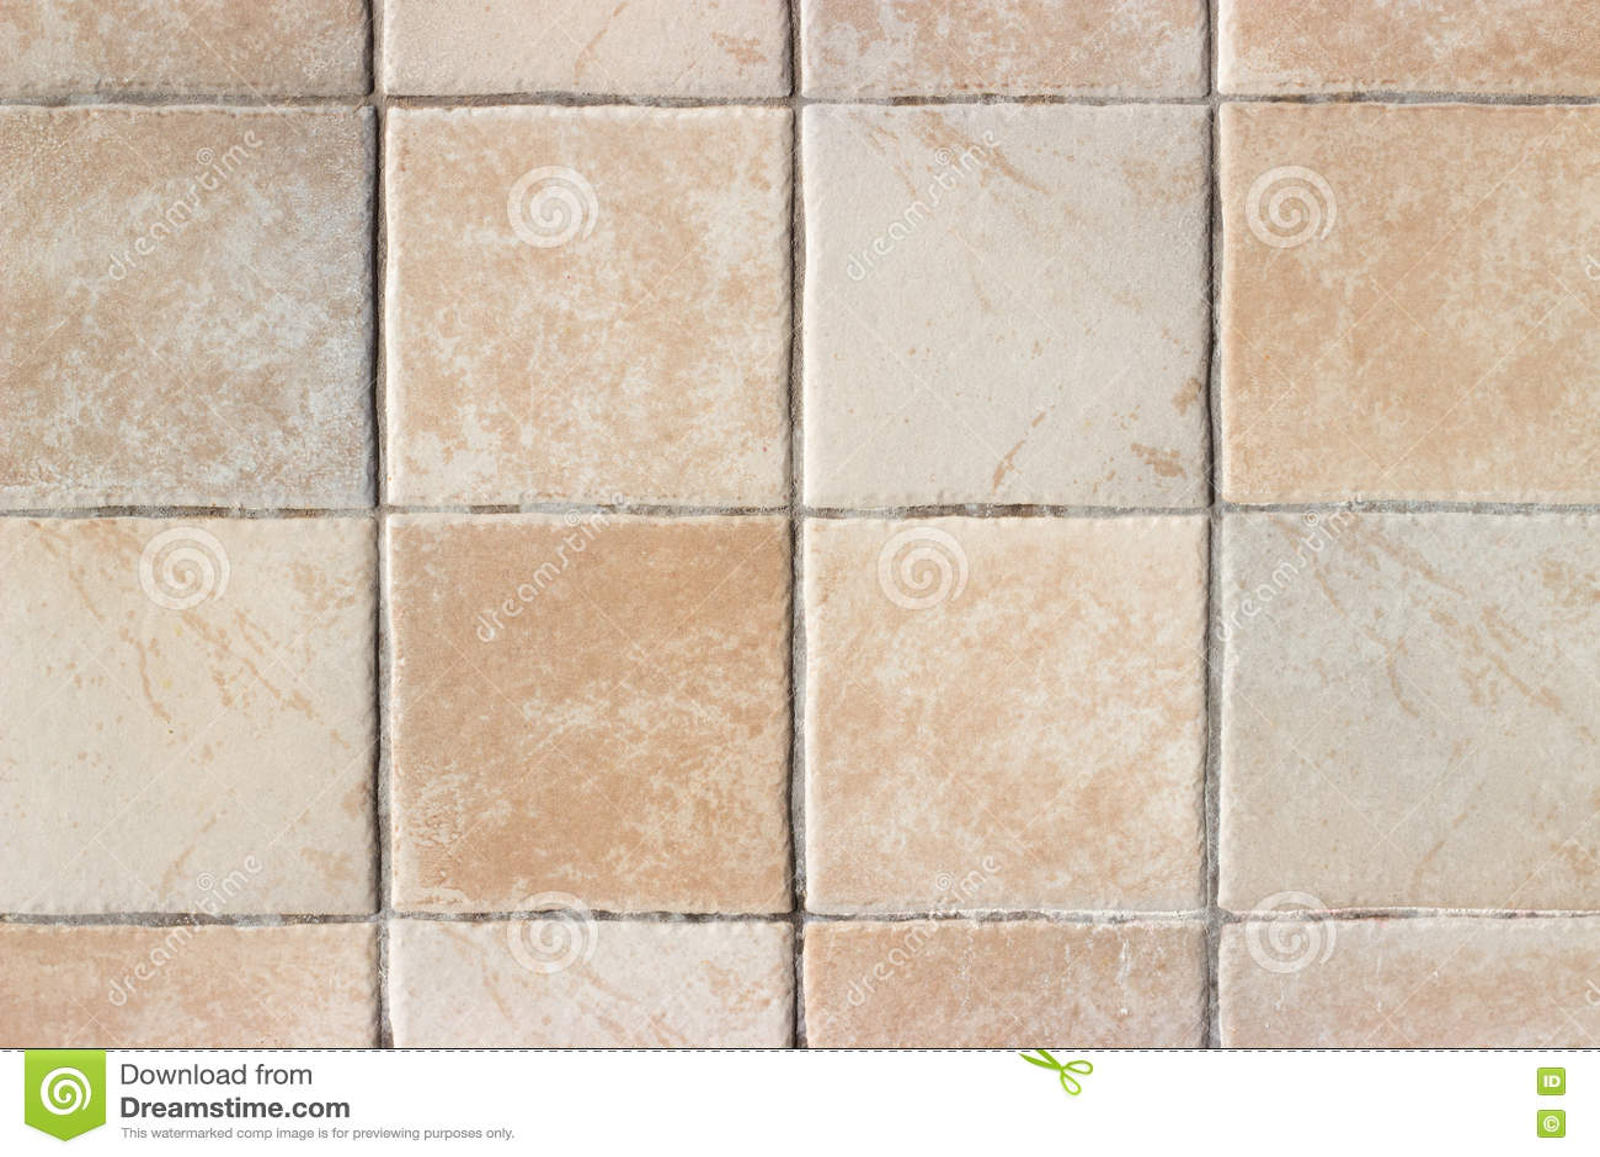 decorative beige kitchen tiles stock photo - image: 80645585